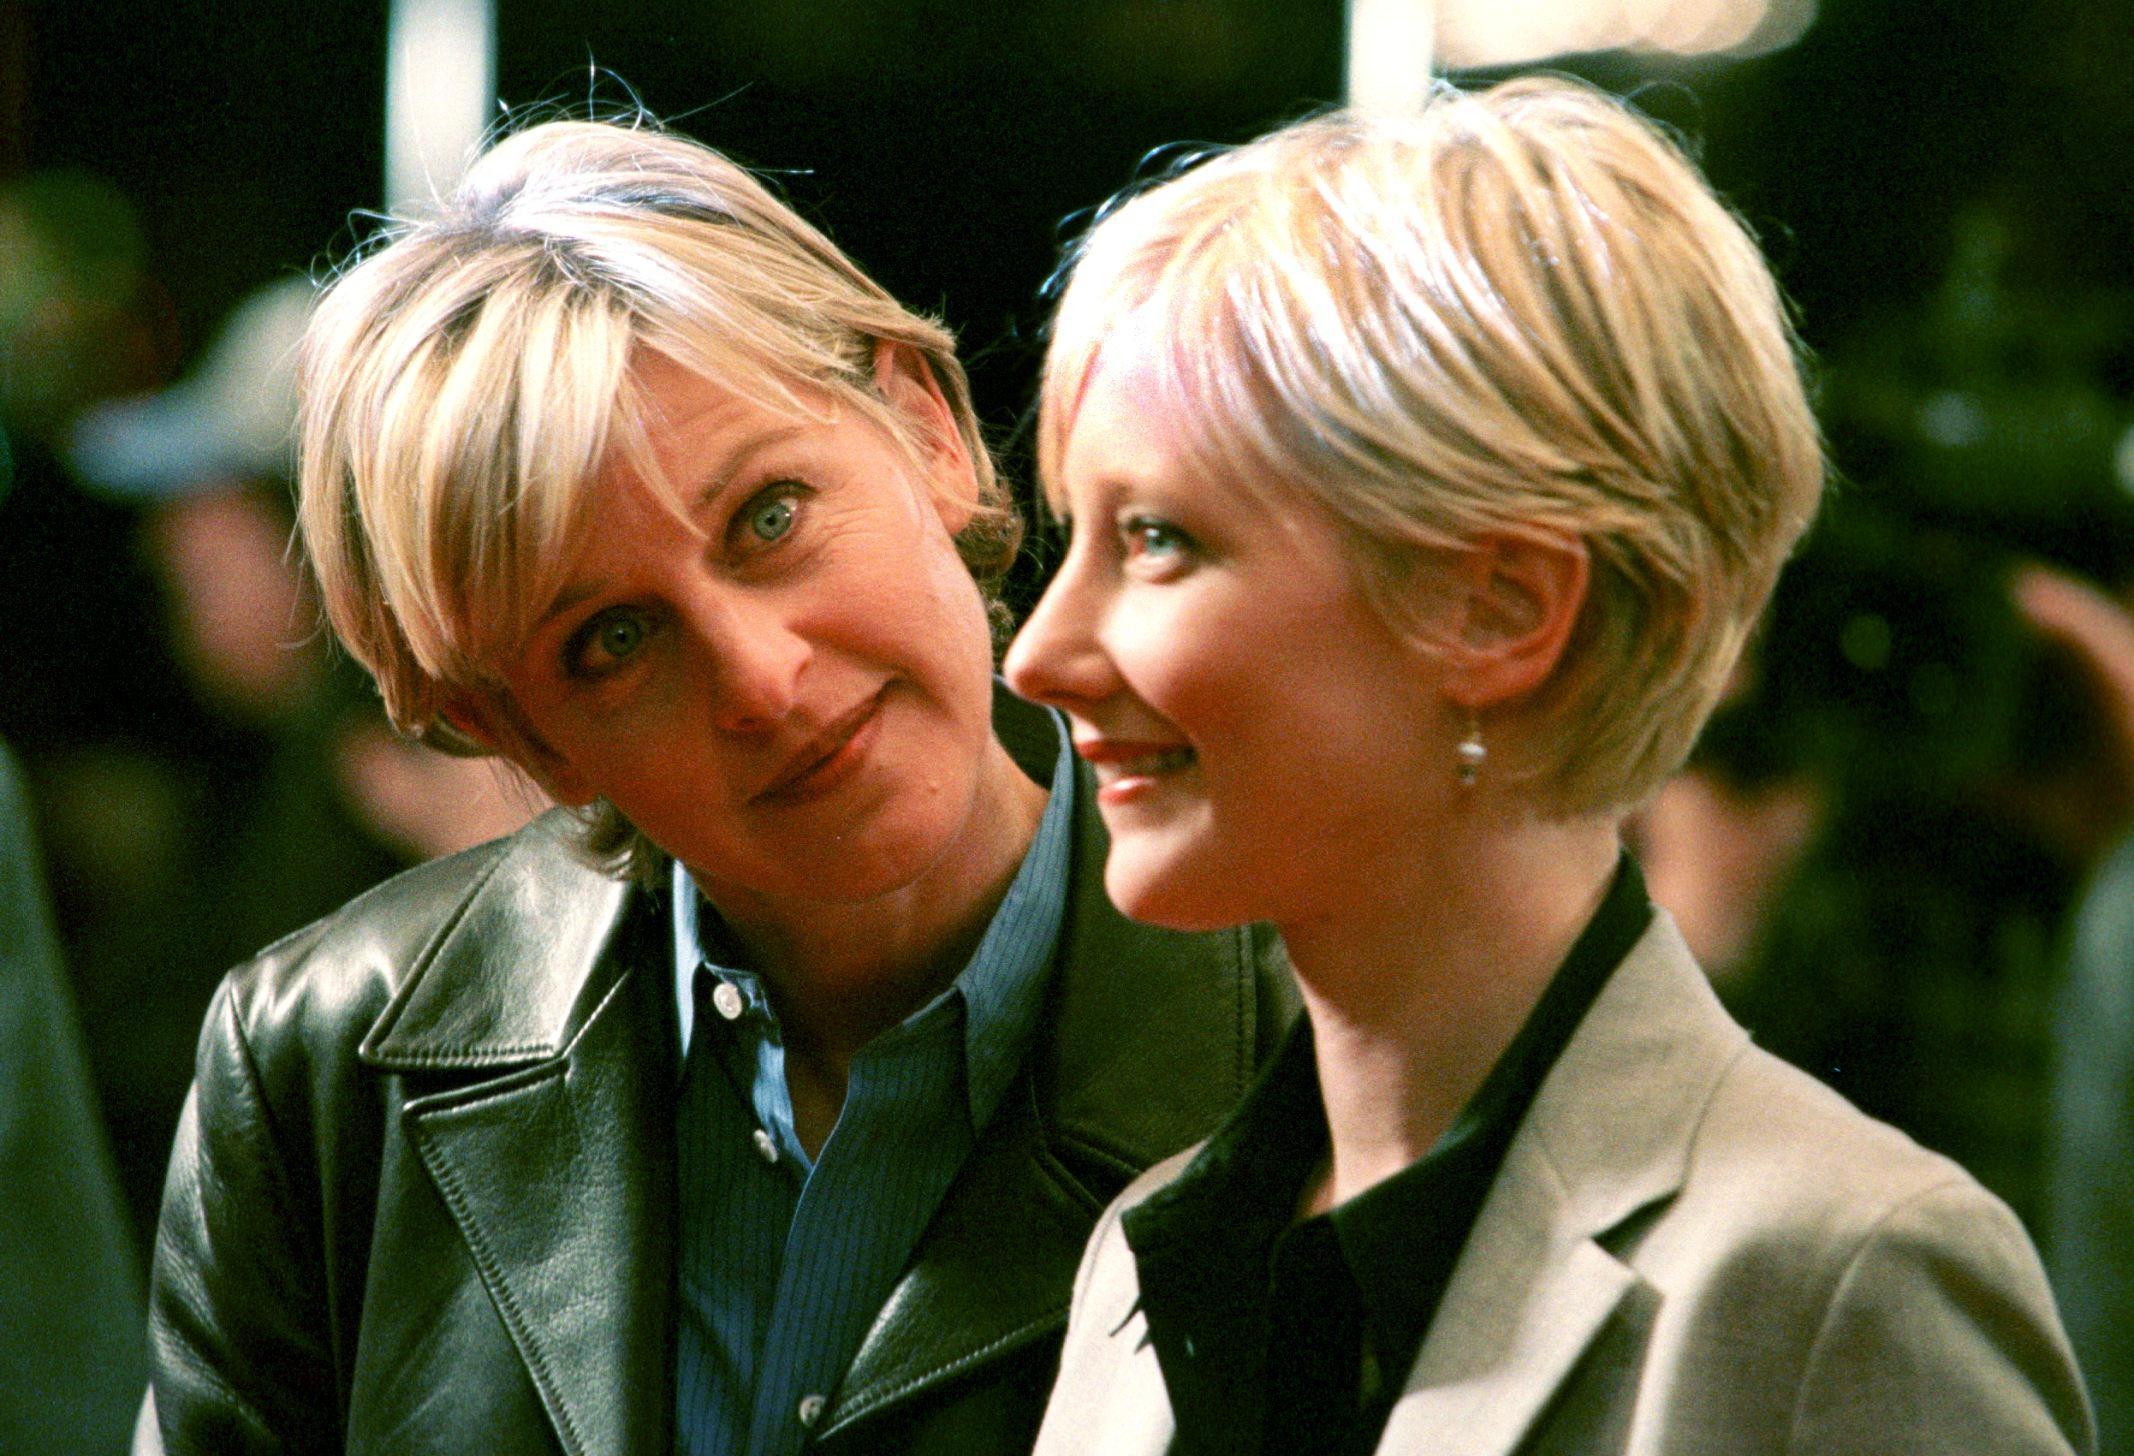 Ellen DeGeneres Ex-Girlfriend Anne Heche Opens up About